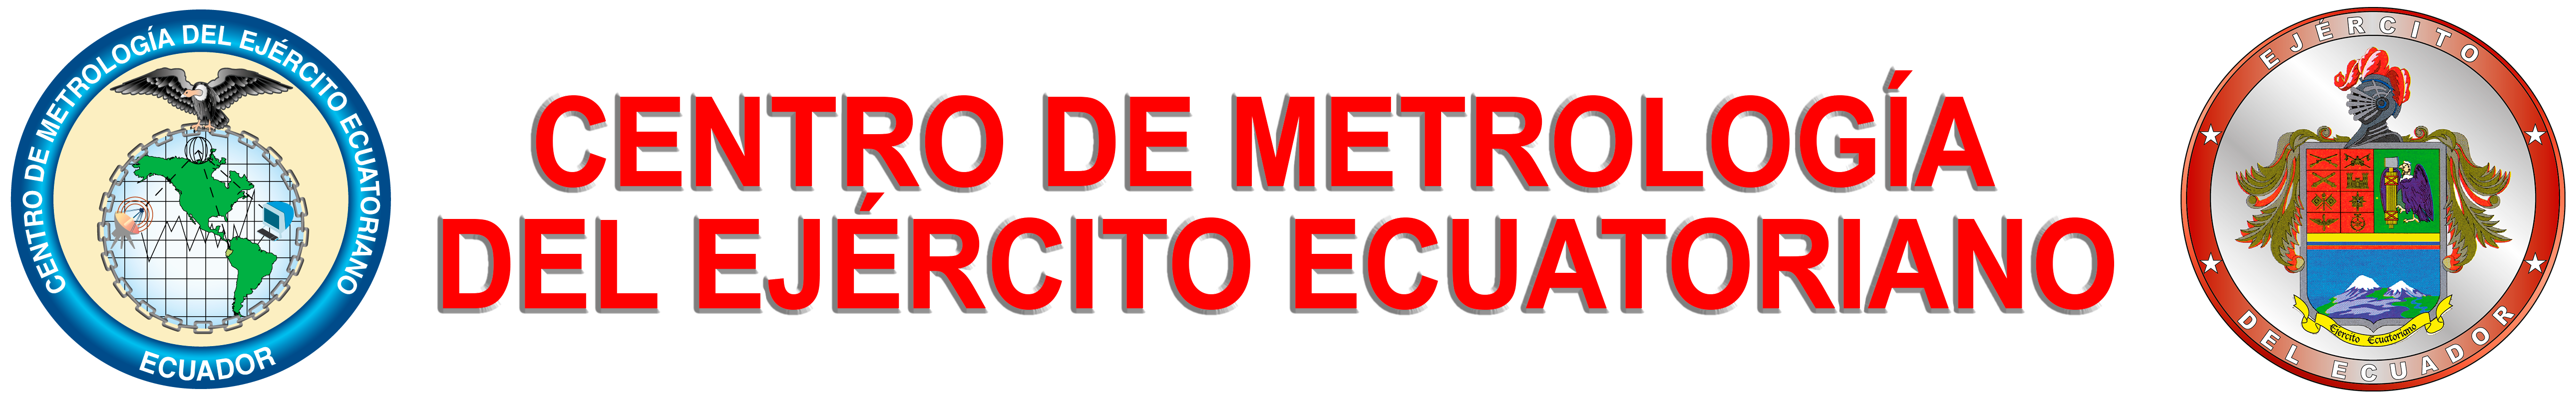 Centro de Metrología